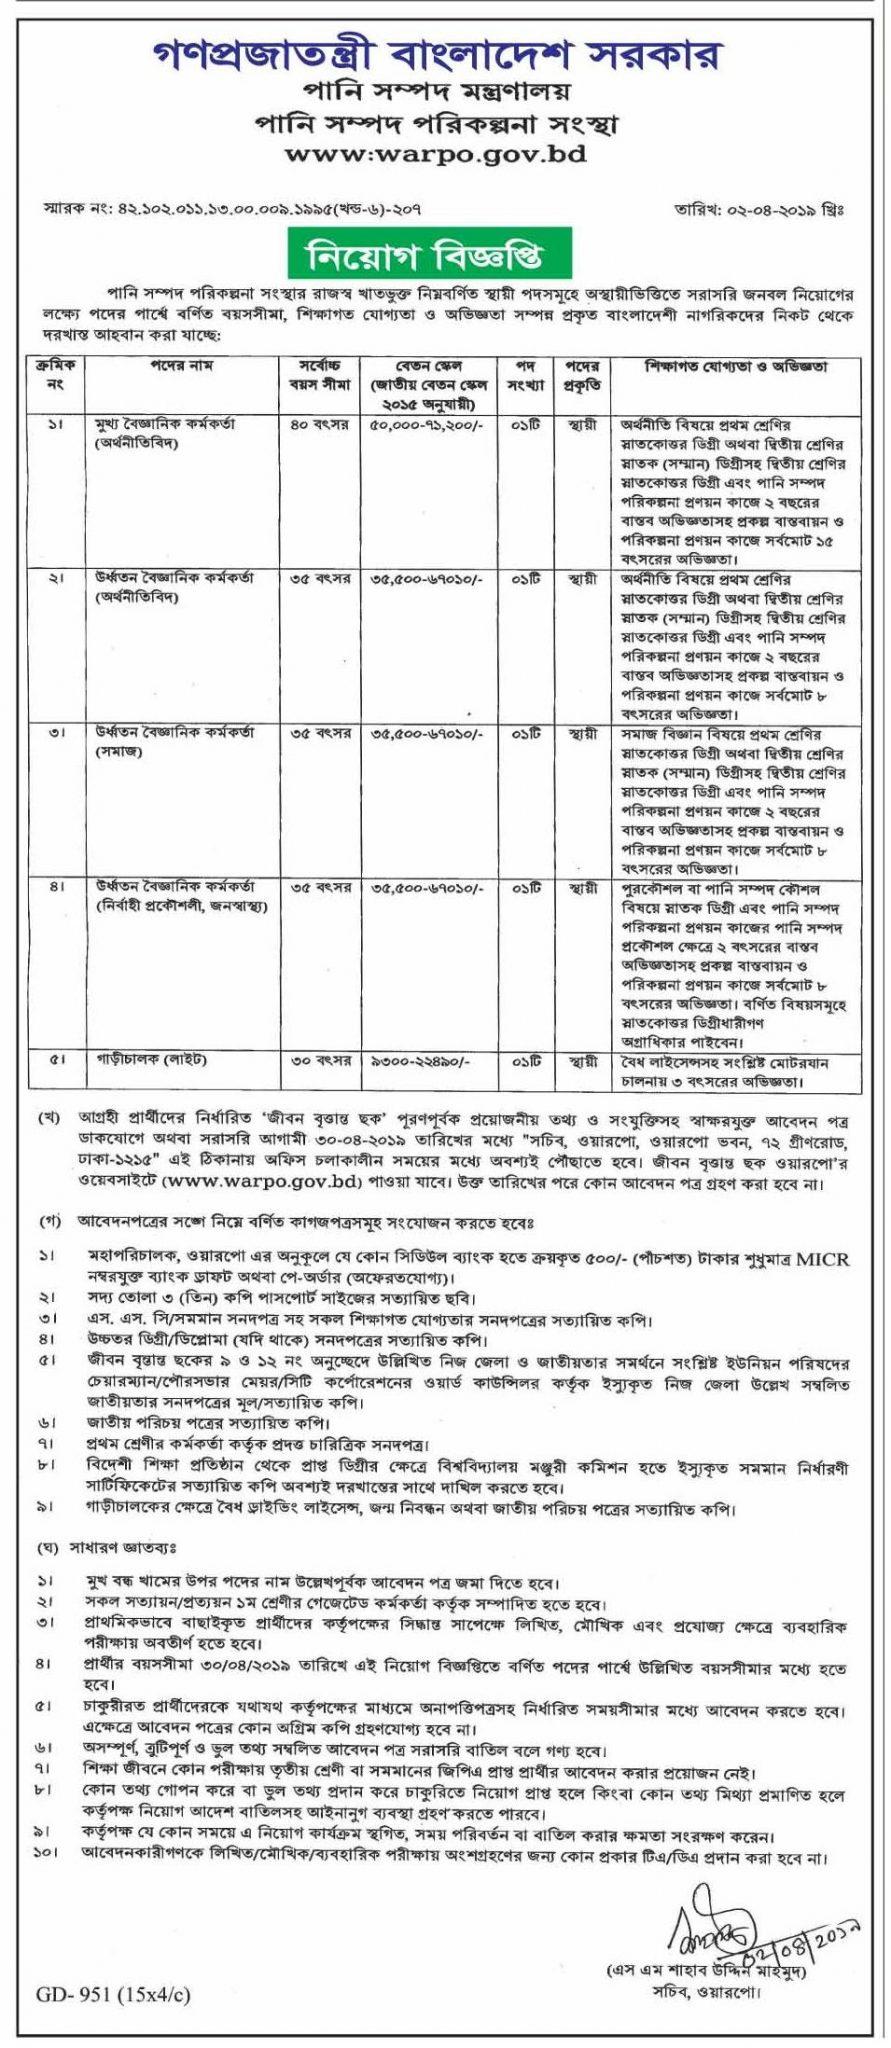 Bangladesh Water Development Board Job Circular-www.bwdb.gov.bd